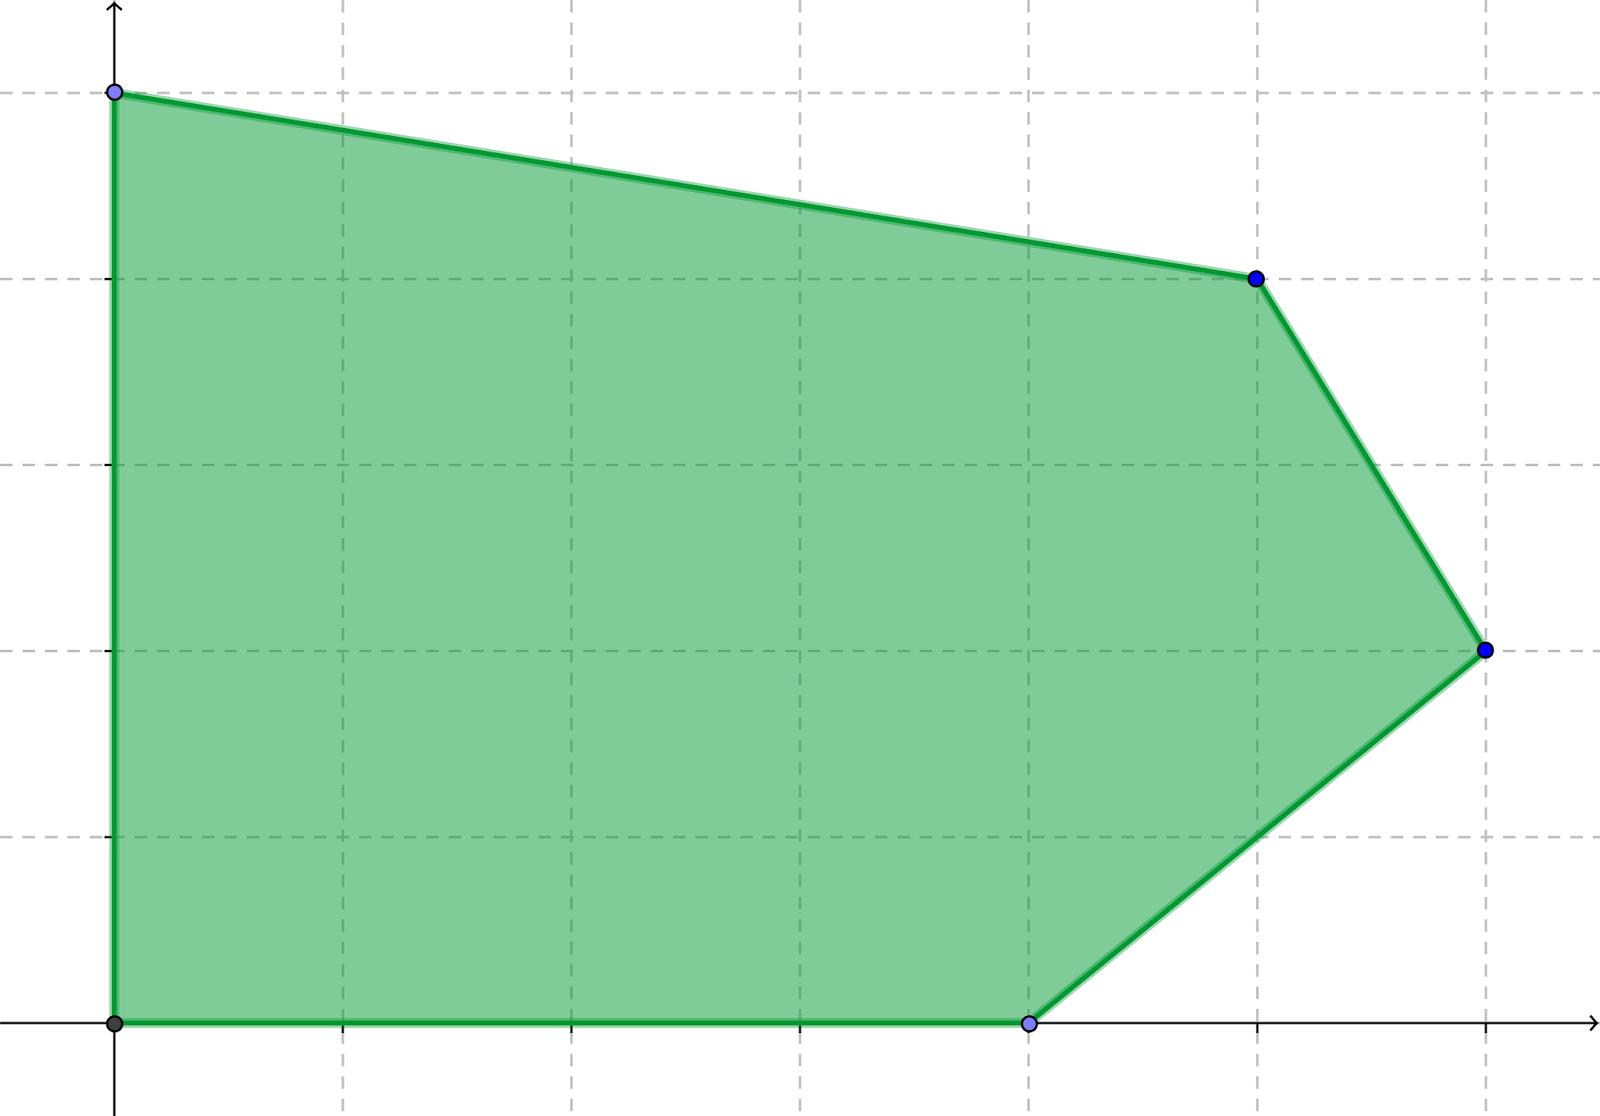 Figure 1: Polytope